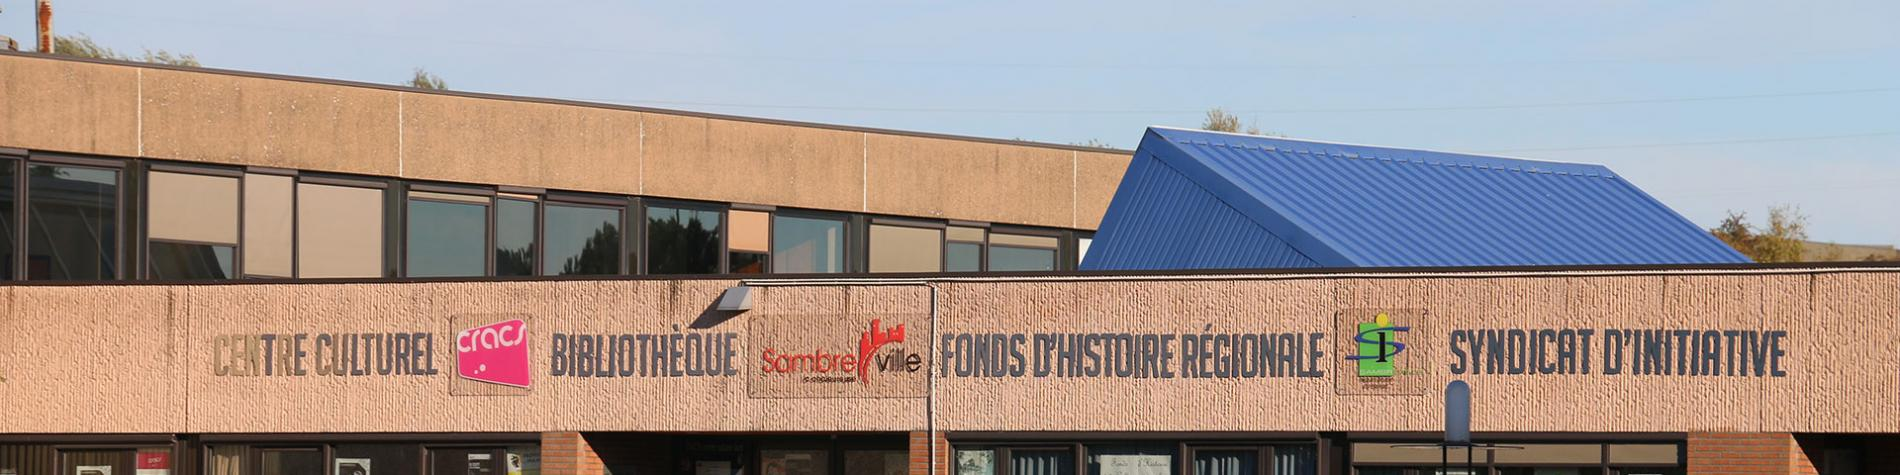 Syndicat d'Initiative - Sambreville